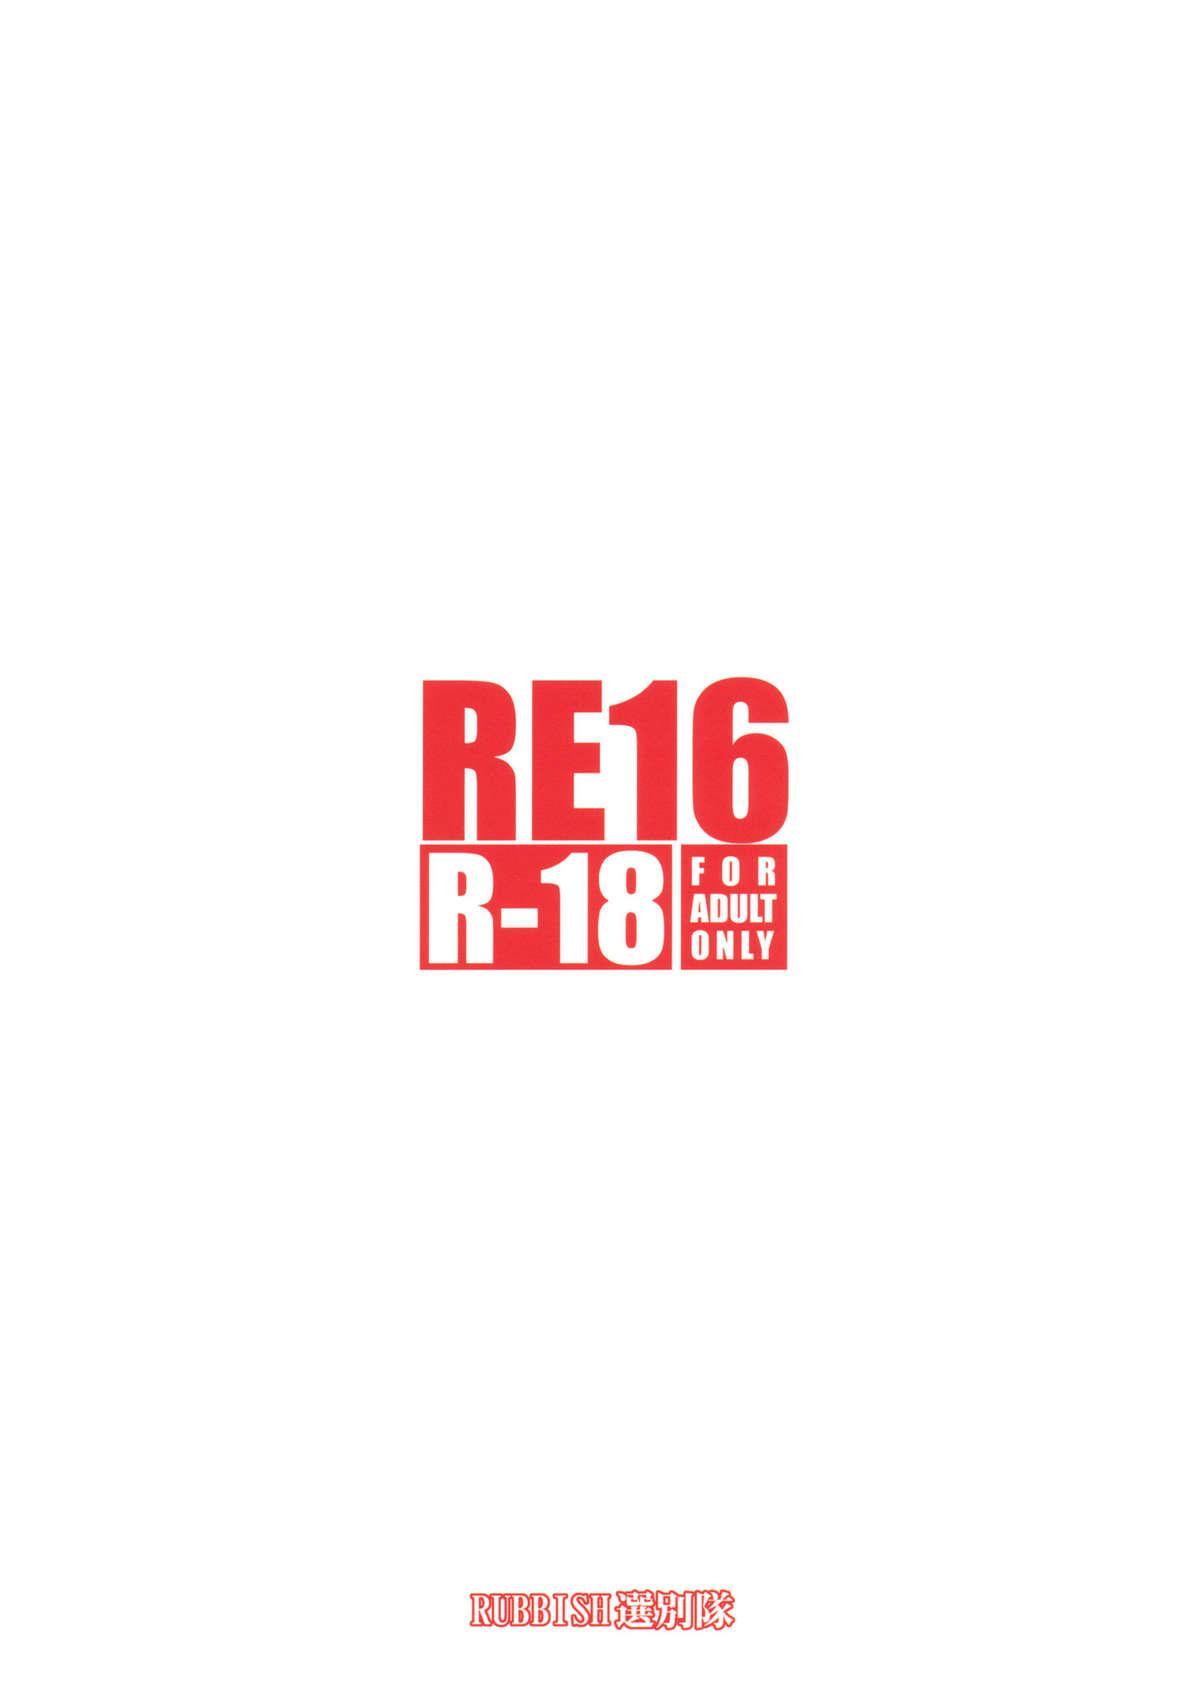 RE 16 28